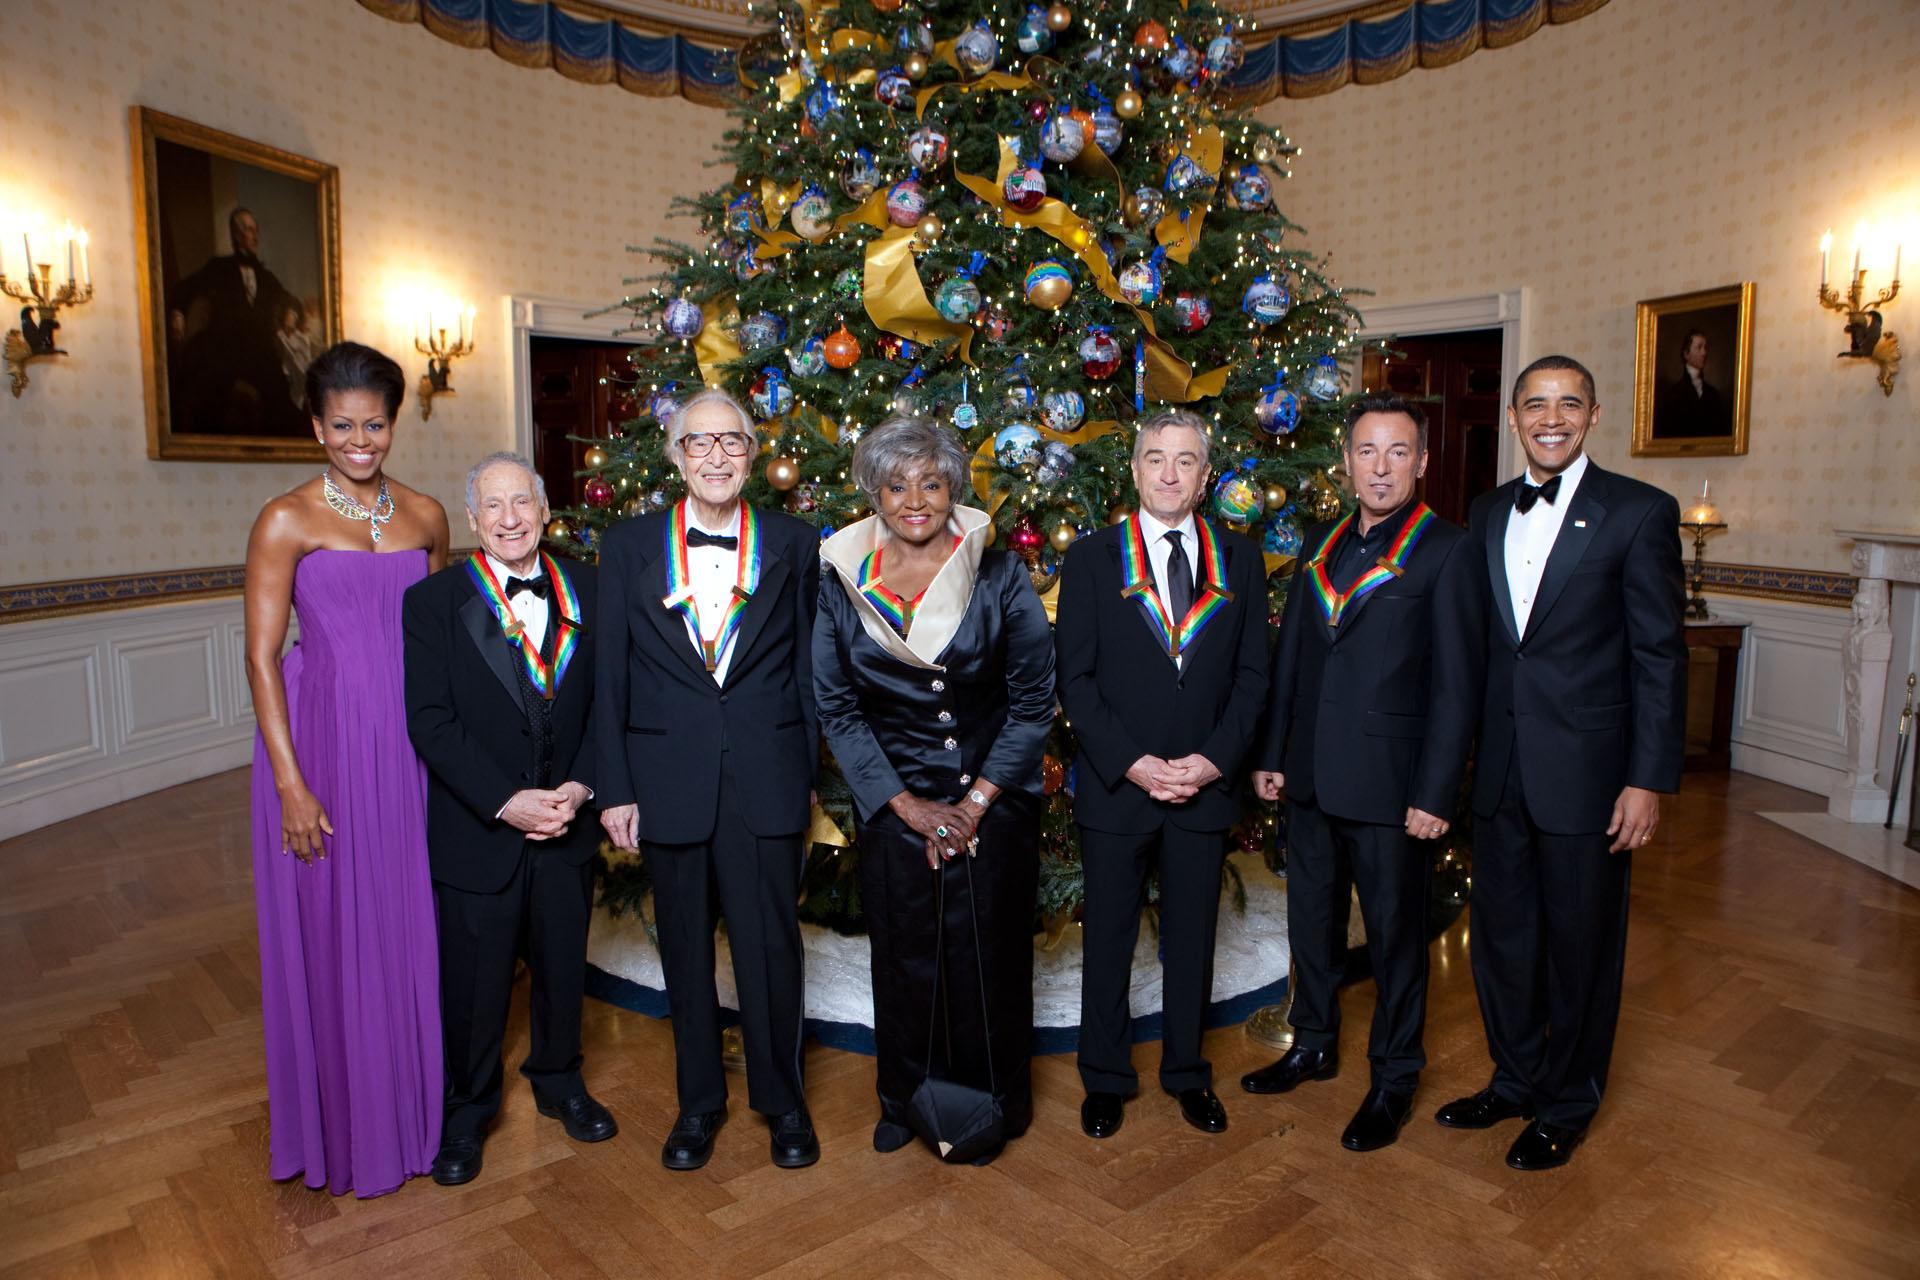 Kennedy Center honorees 2009 WhiteHouse Photo.jpg